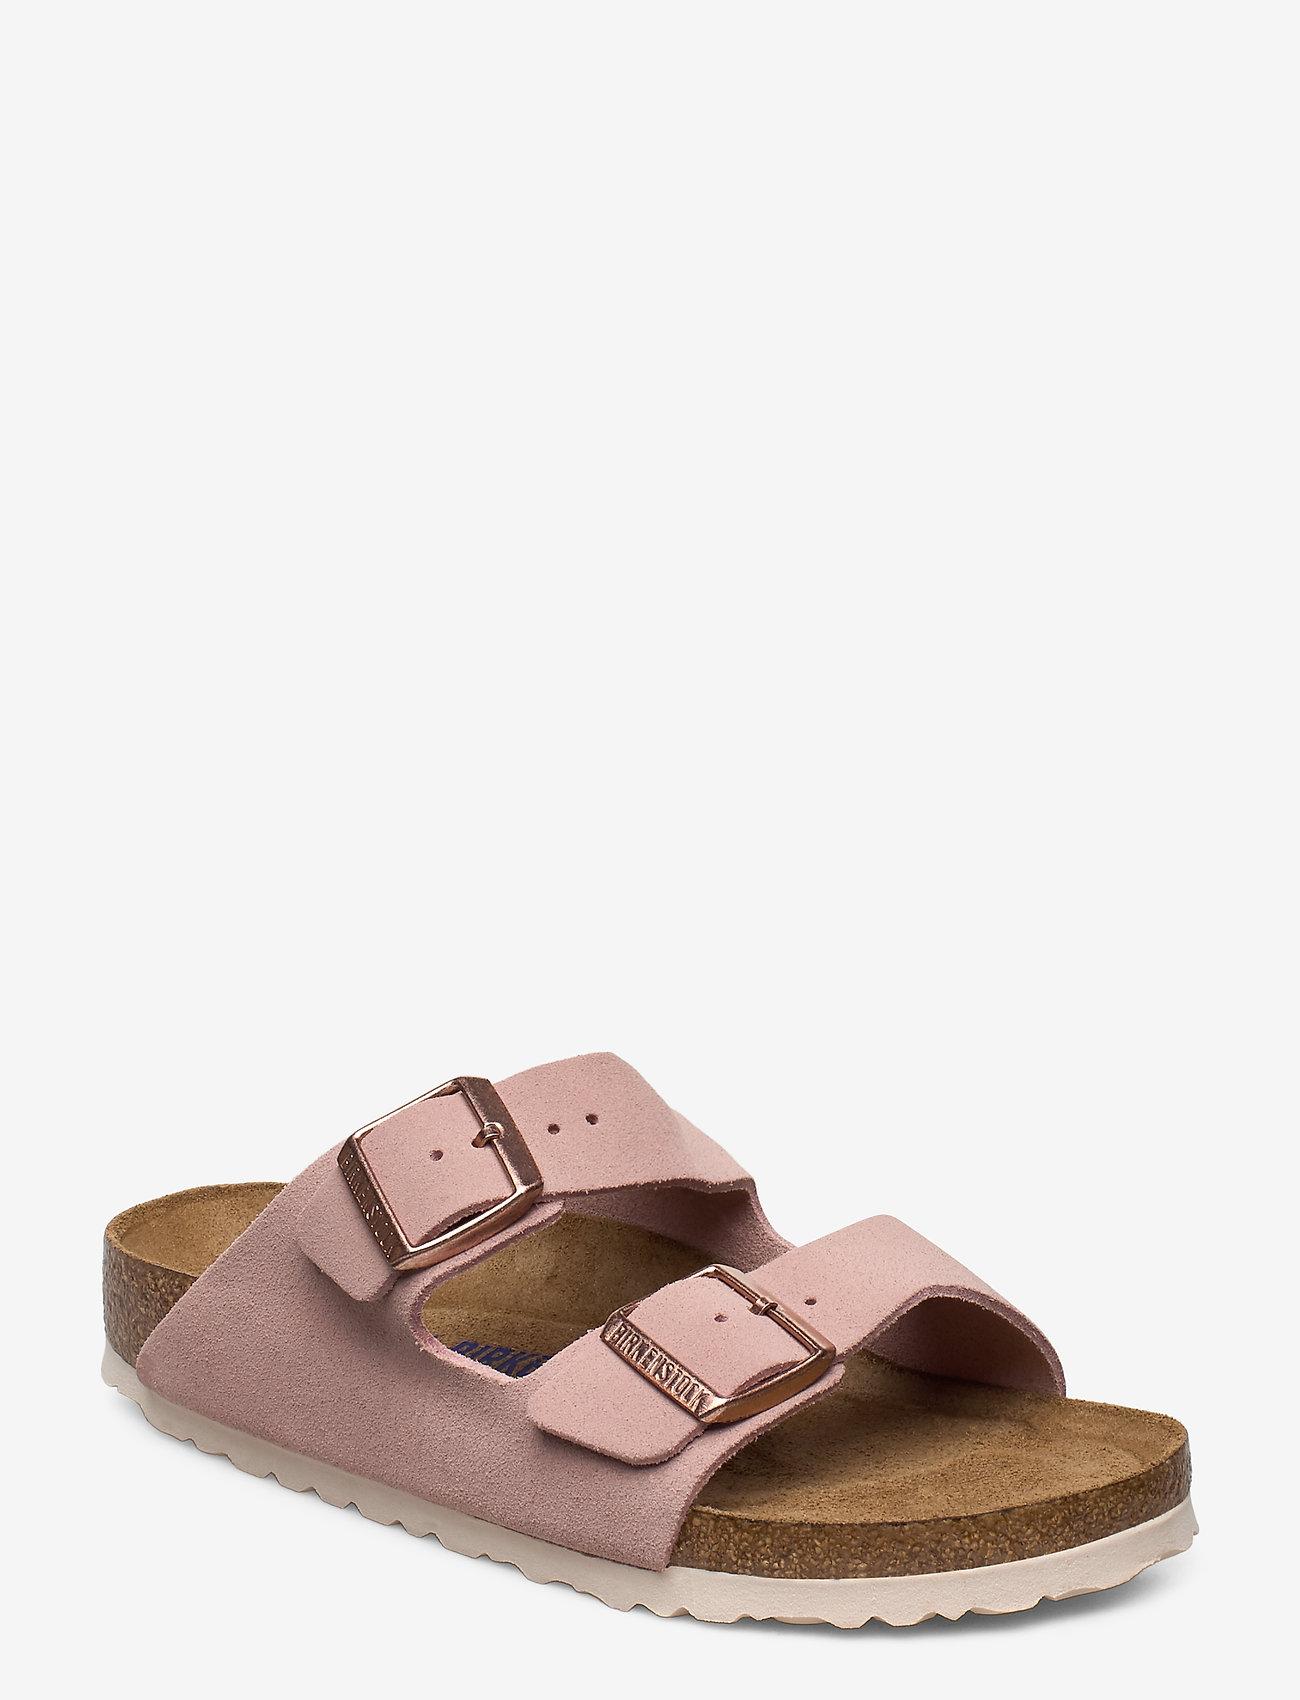 Birkenstock - Arizona Soft Footbed - light rose - 0